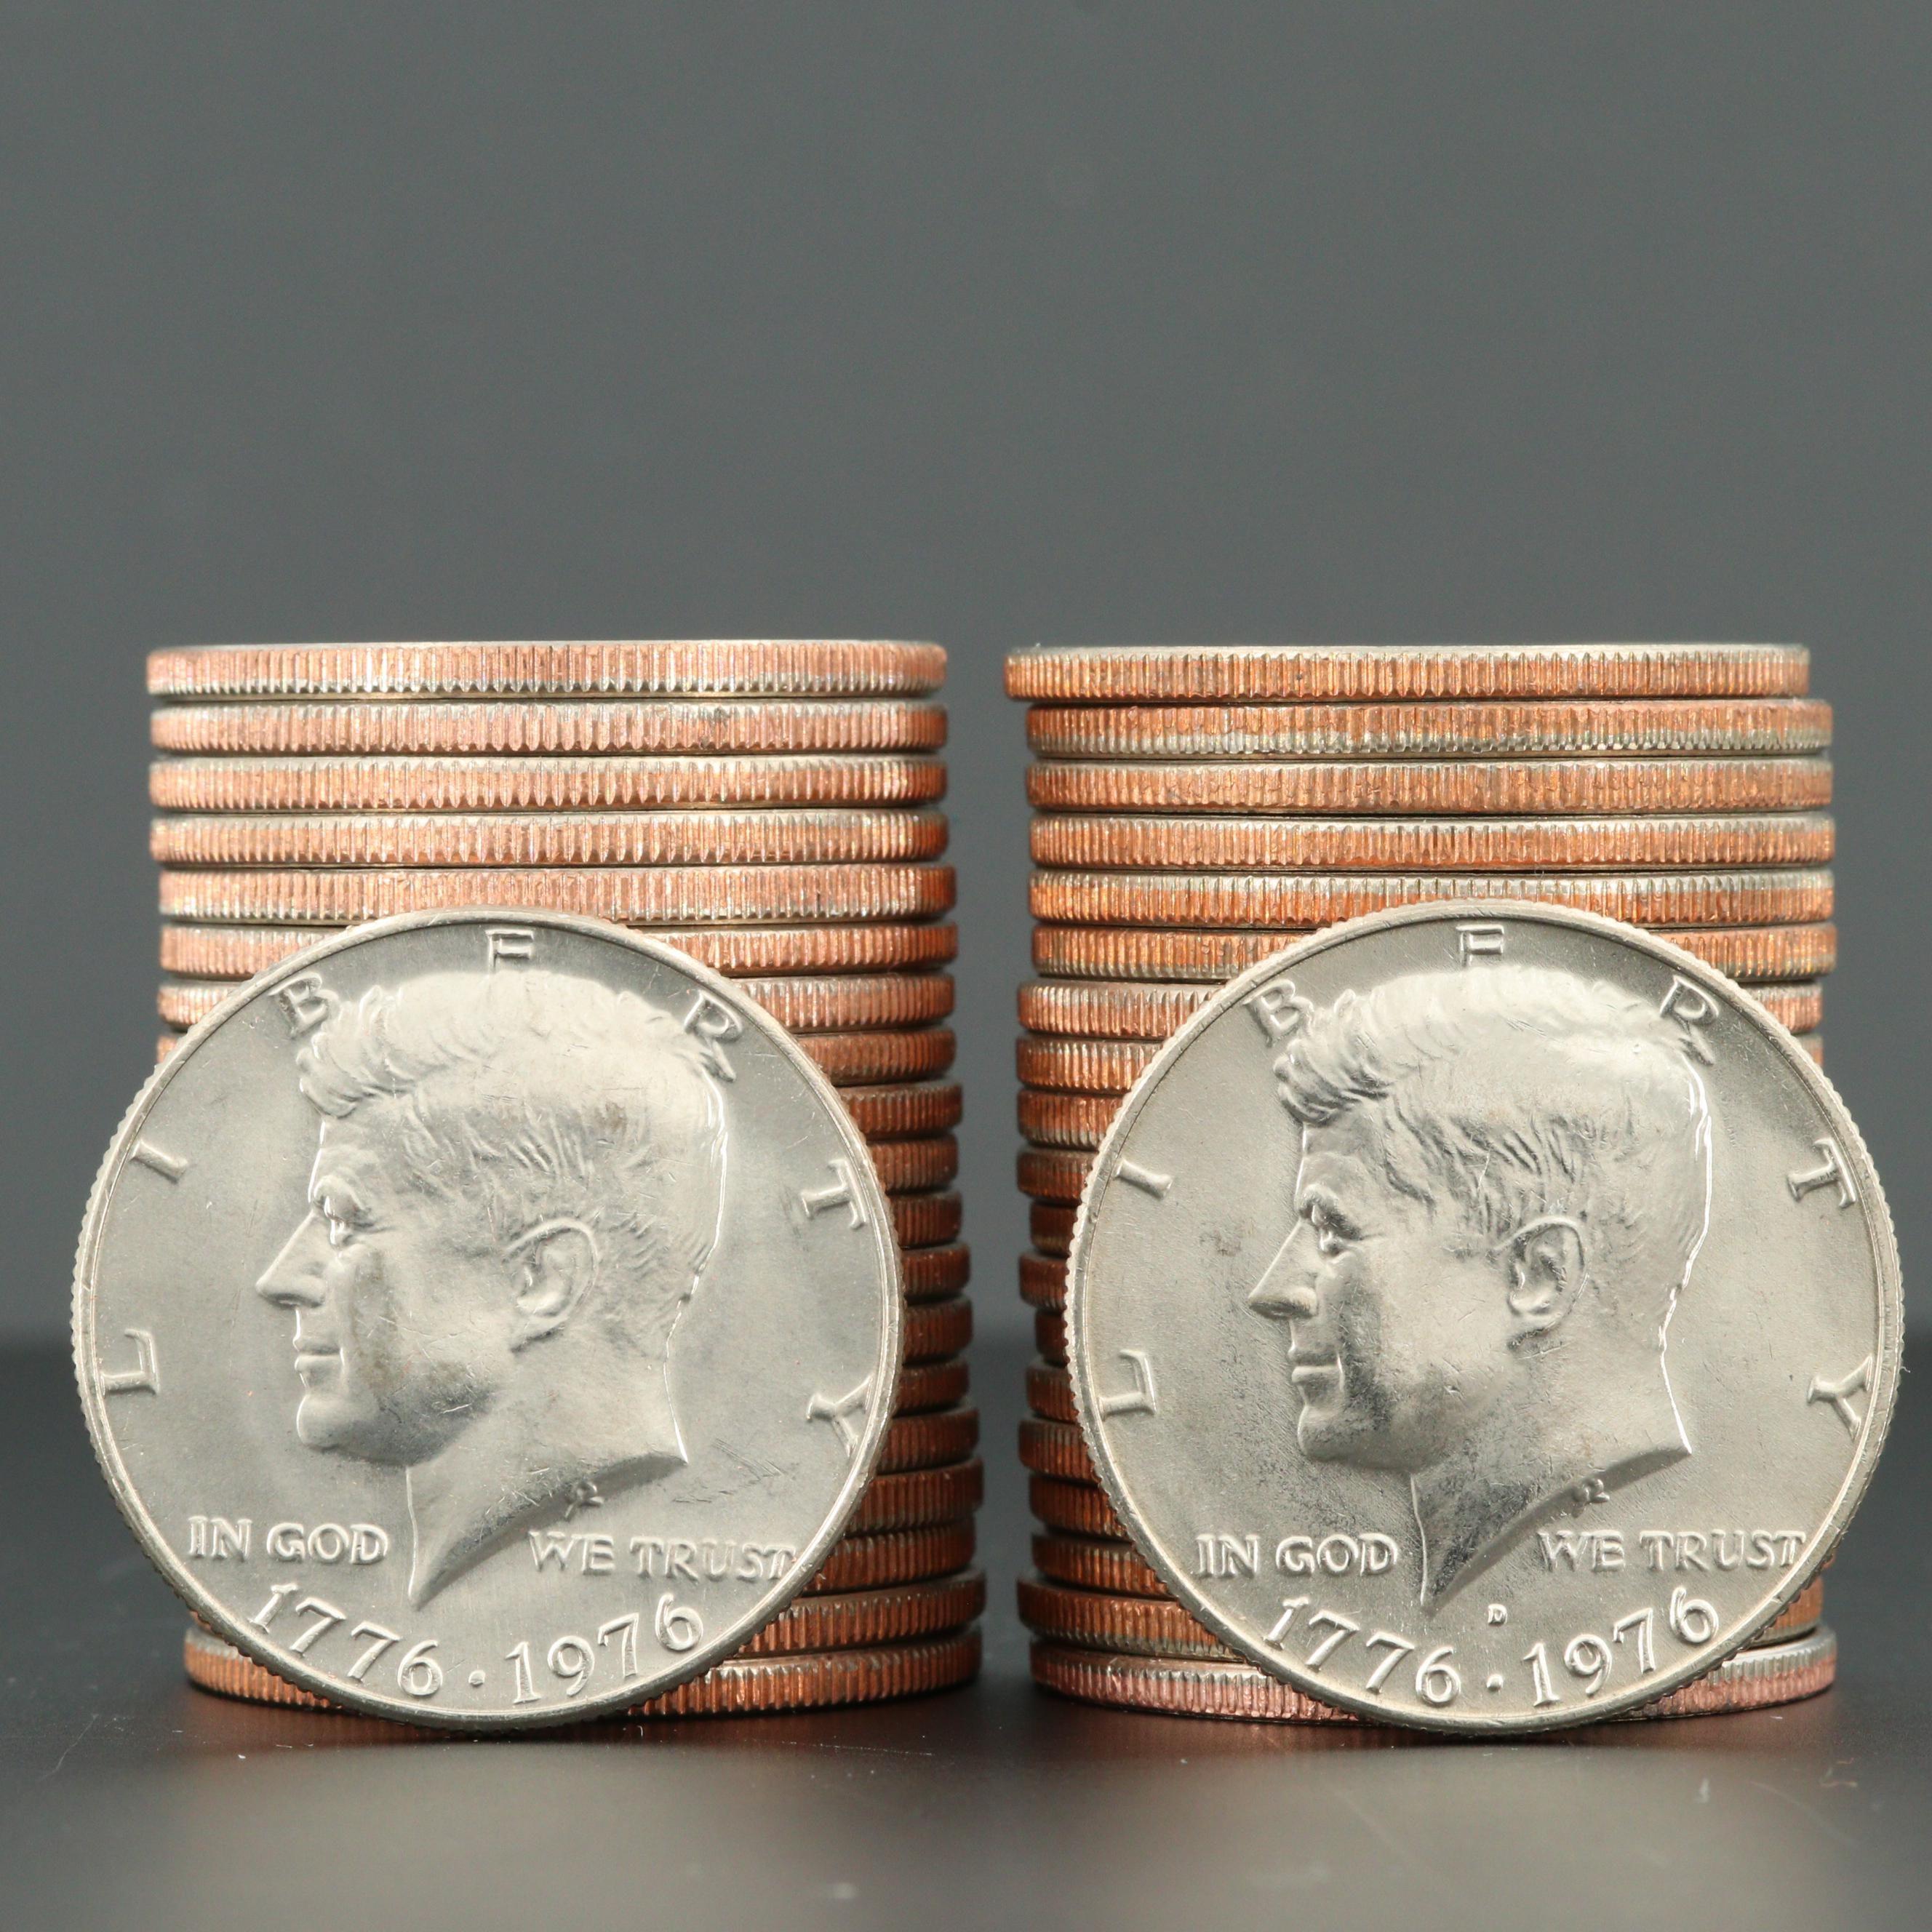 Two Rolls of 1976 JFK Bicentennial Half Dollars